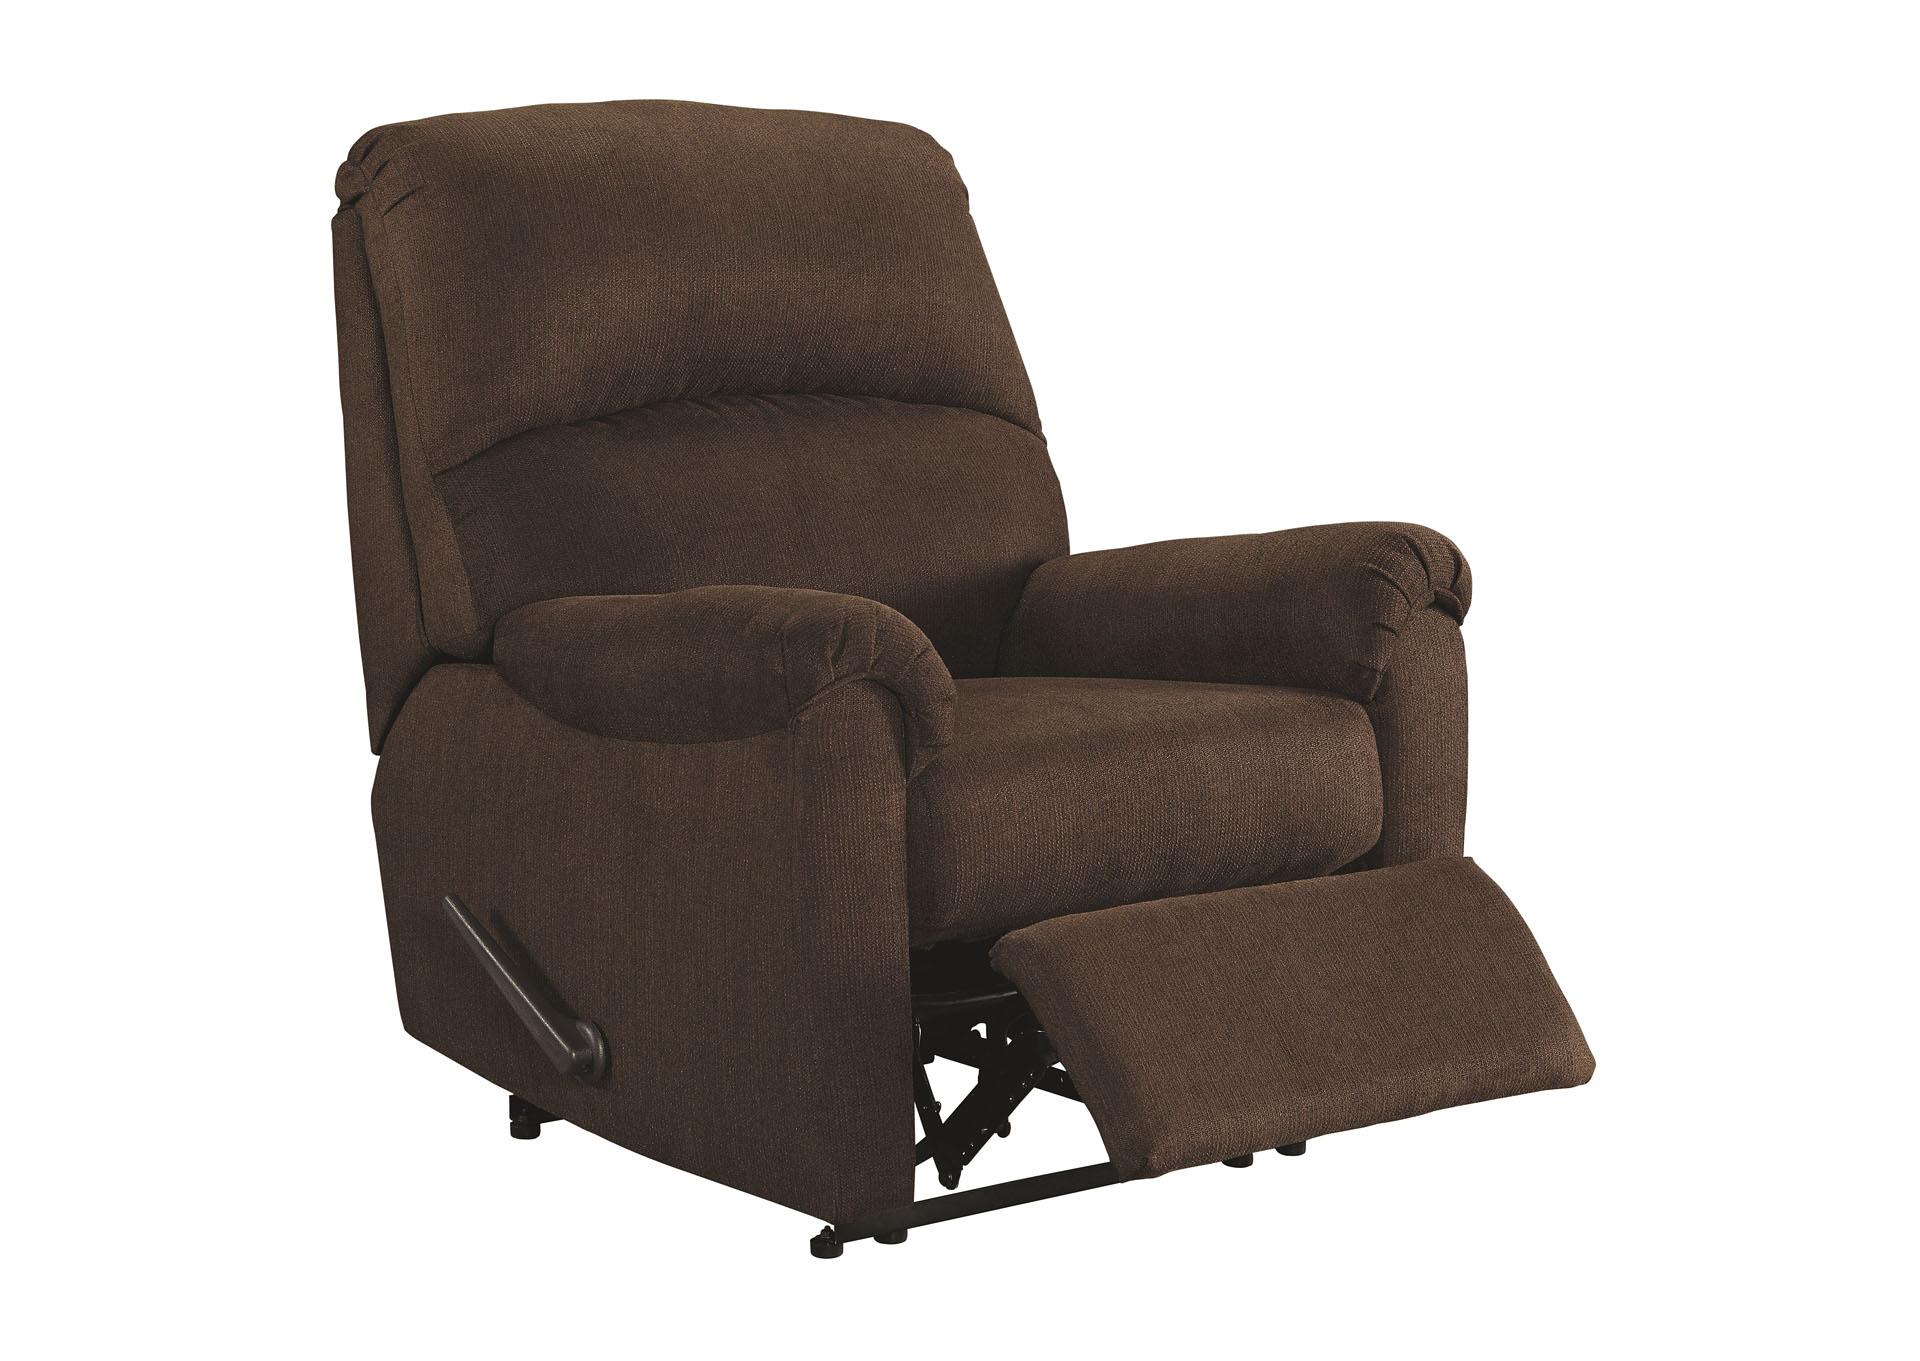 Ivan smith otwell java zero wall recliner for Ivan smith furniture